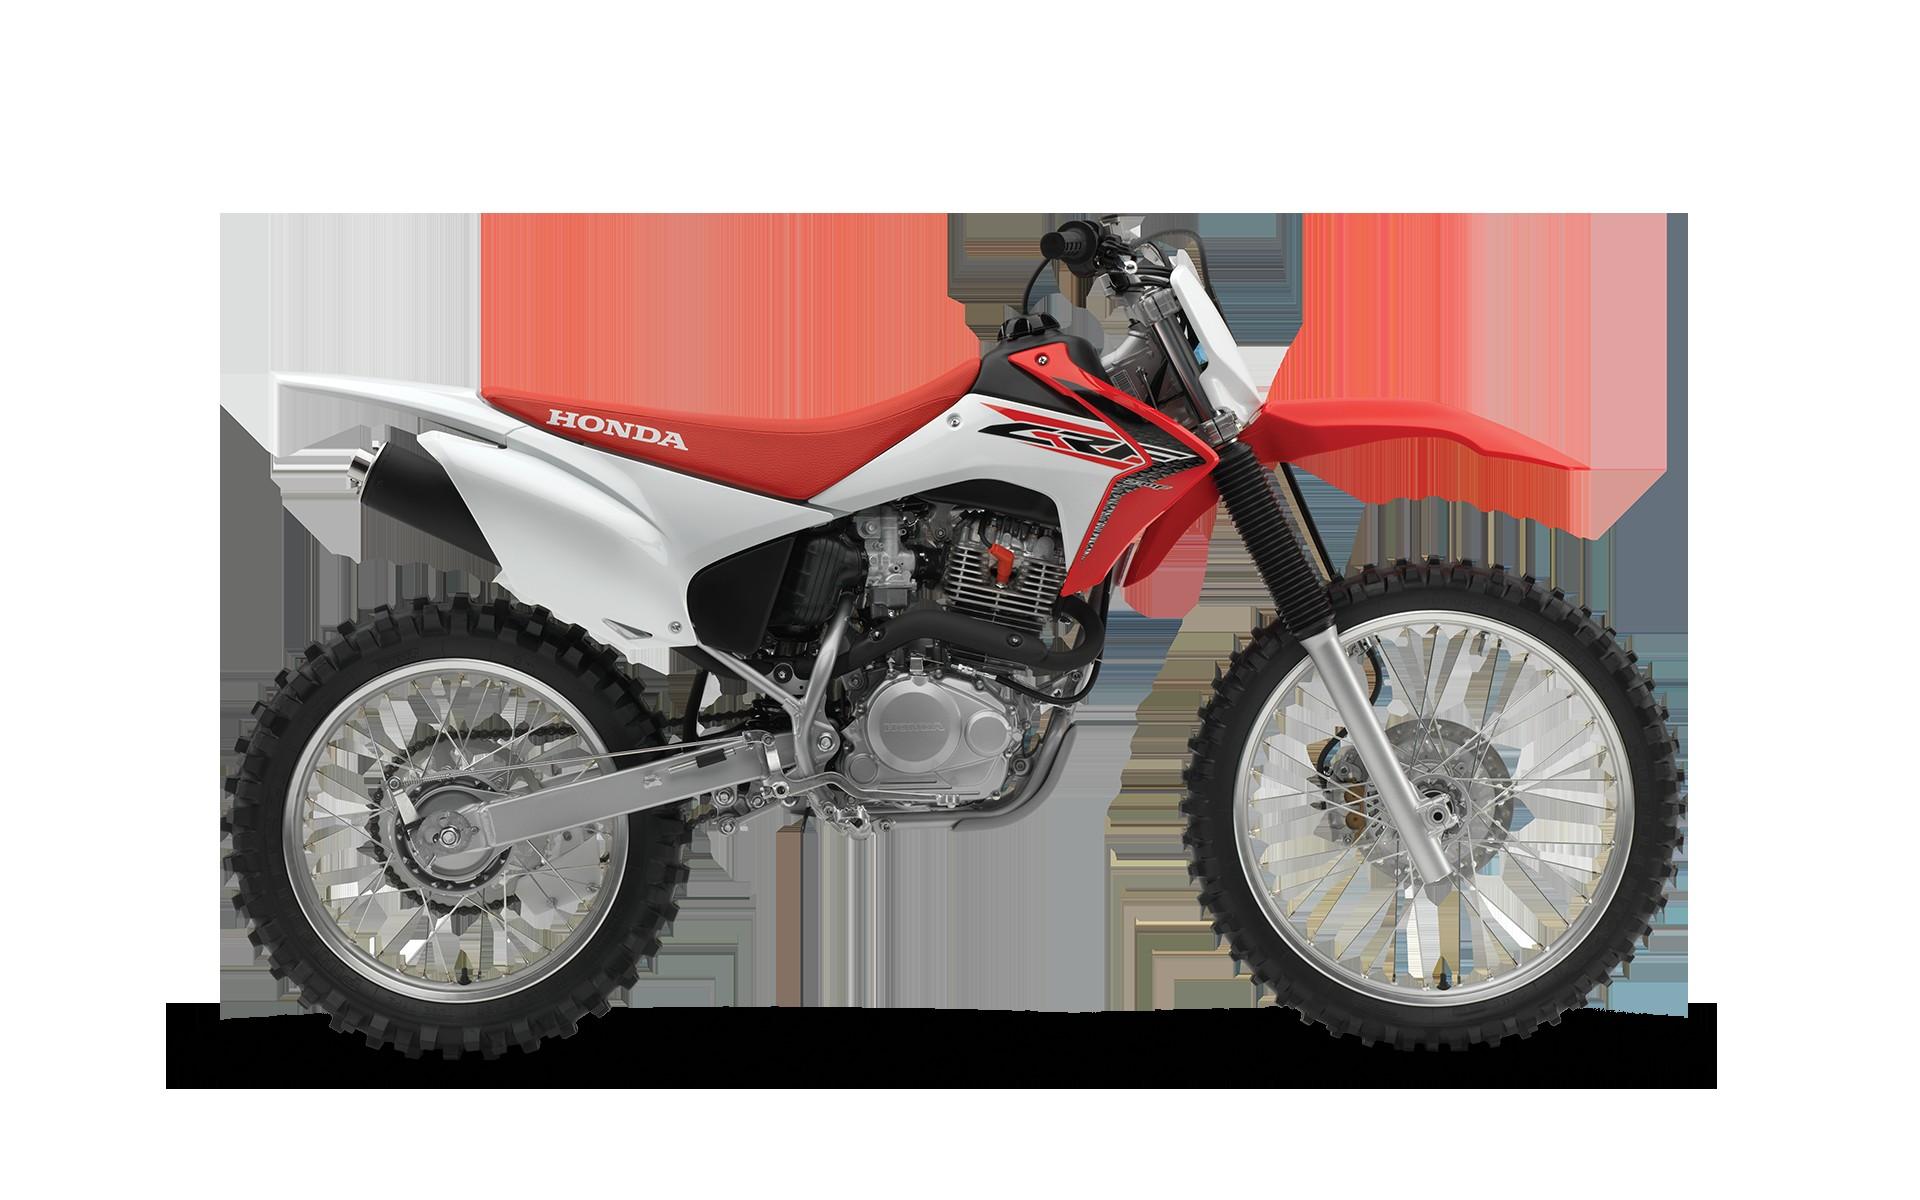 Honda Crf230f Parts Diagram Crf230f Dirtbikes for More Challenging Terrain Of Honda Crf230f Parts Diagram